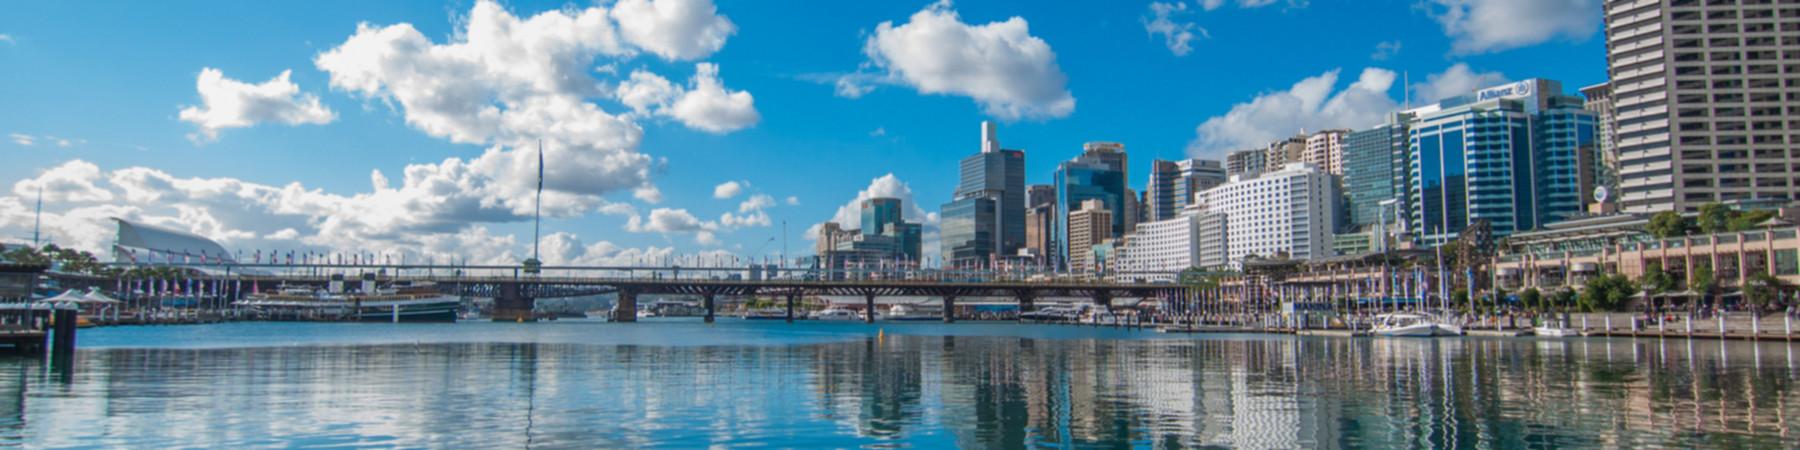 SydneyDarling Harbour Wikitravel